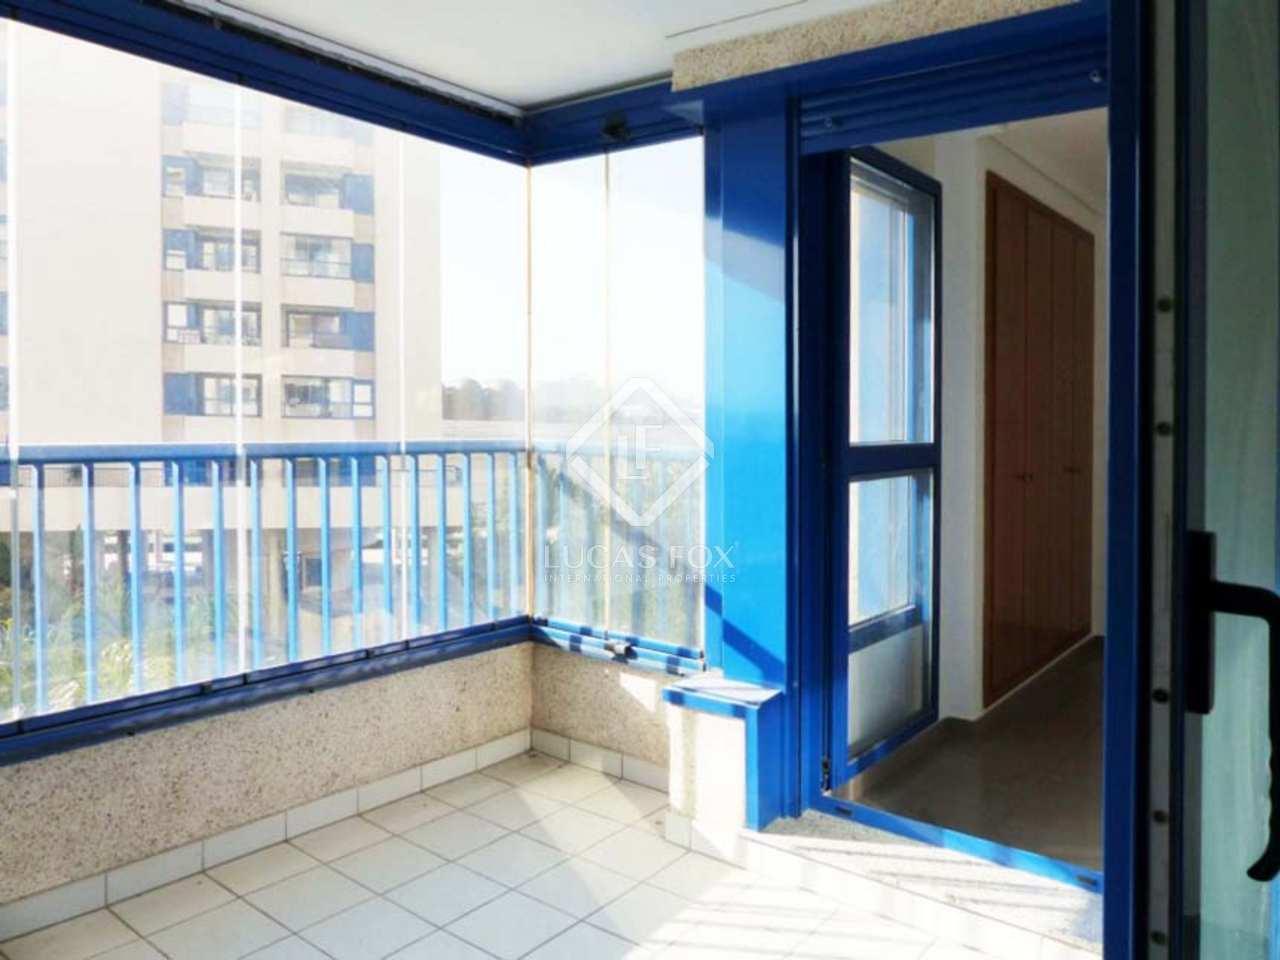 Venta de apartamento en primera l nea de playa patacona for Piscina patacona